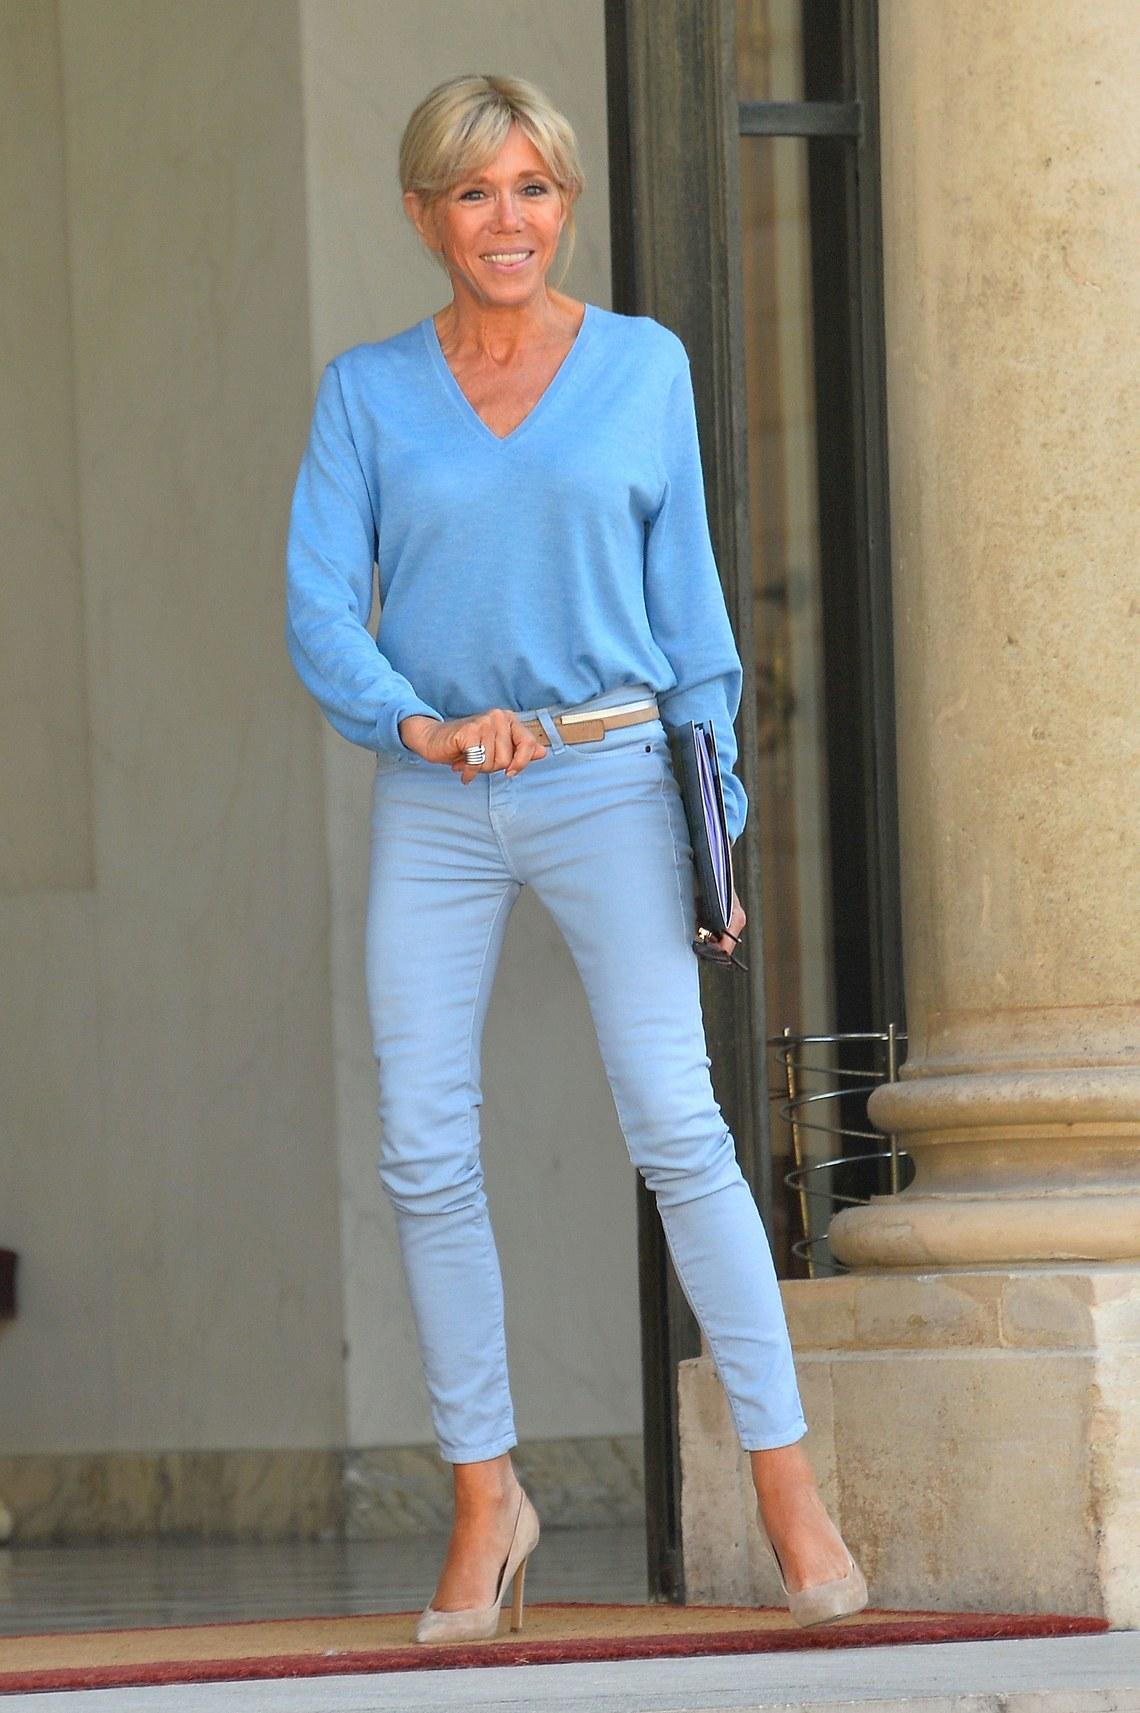 Brigitte Macron photo gallery - high quality pics of